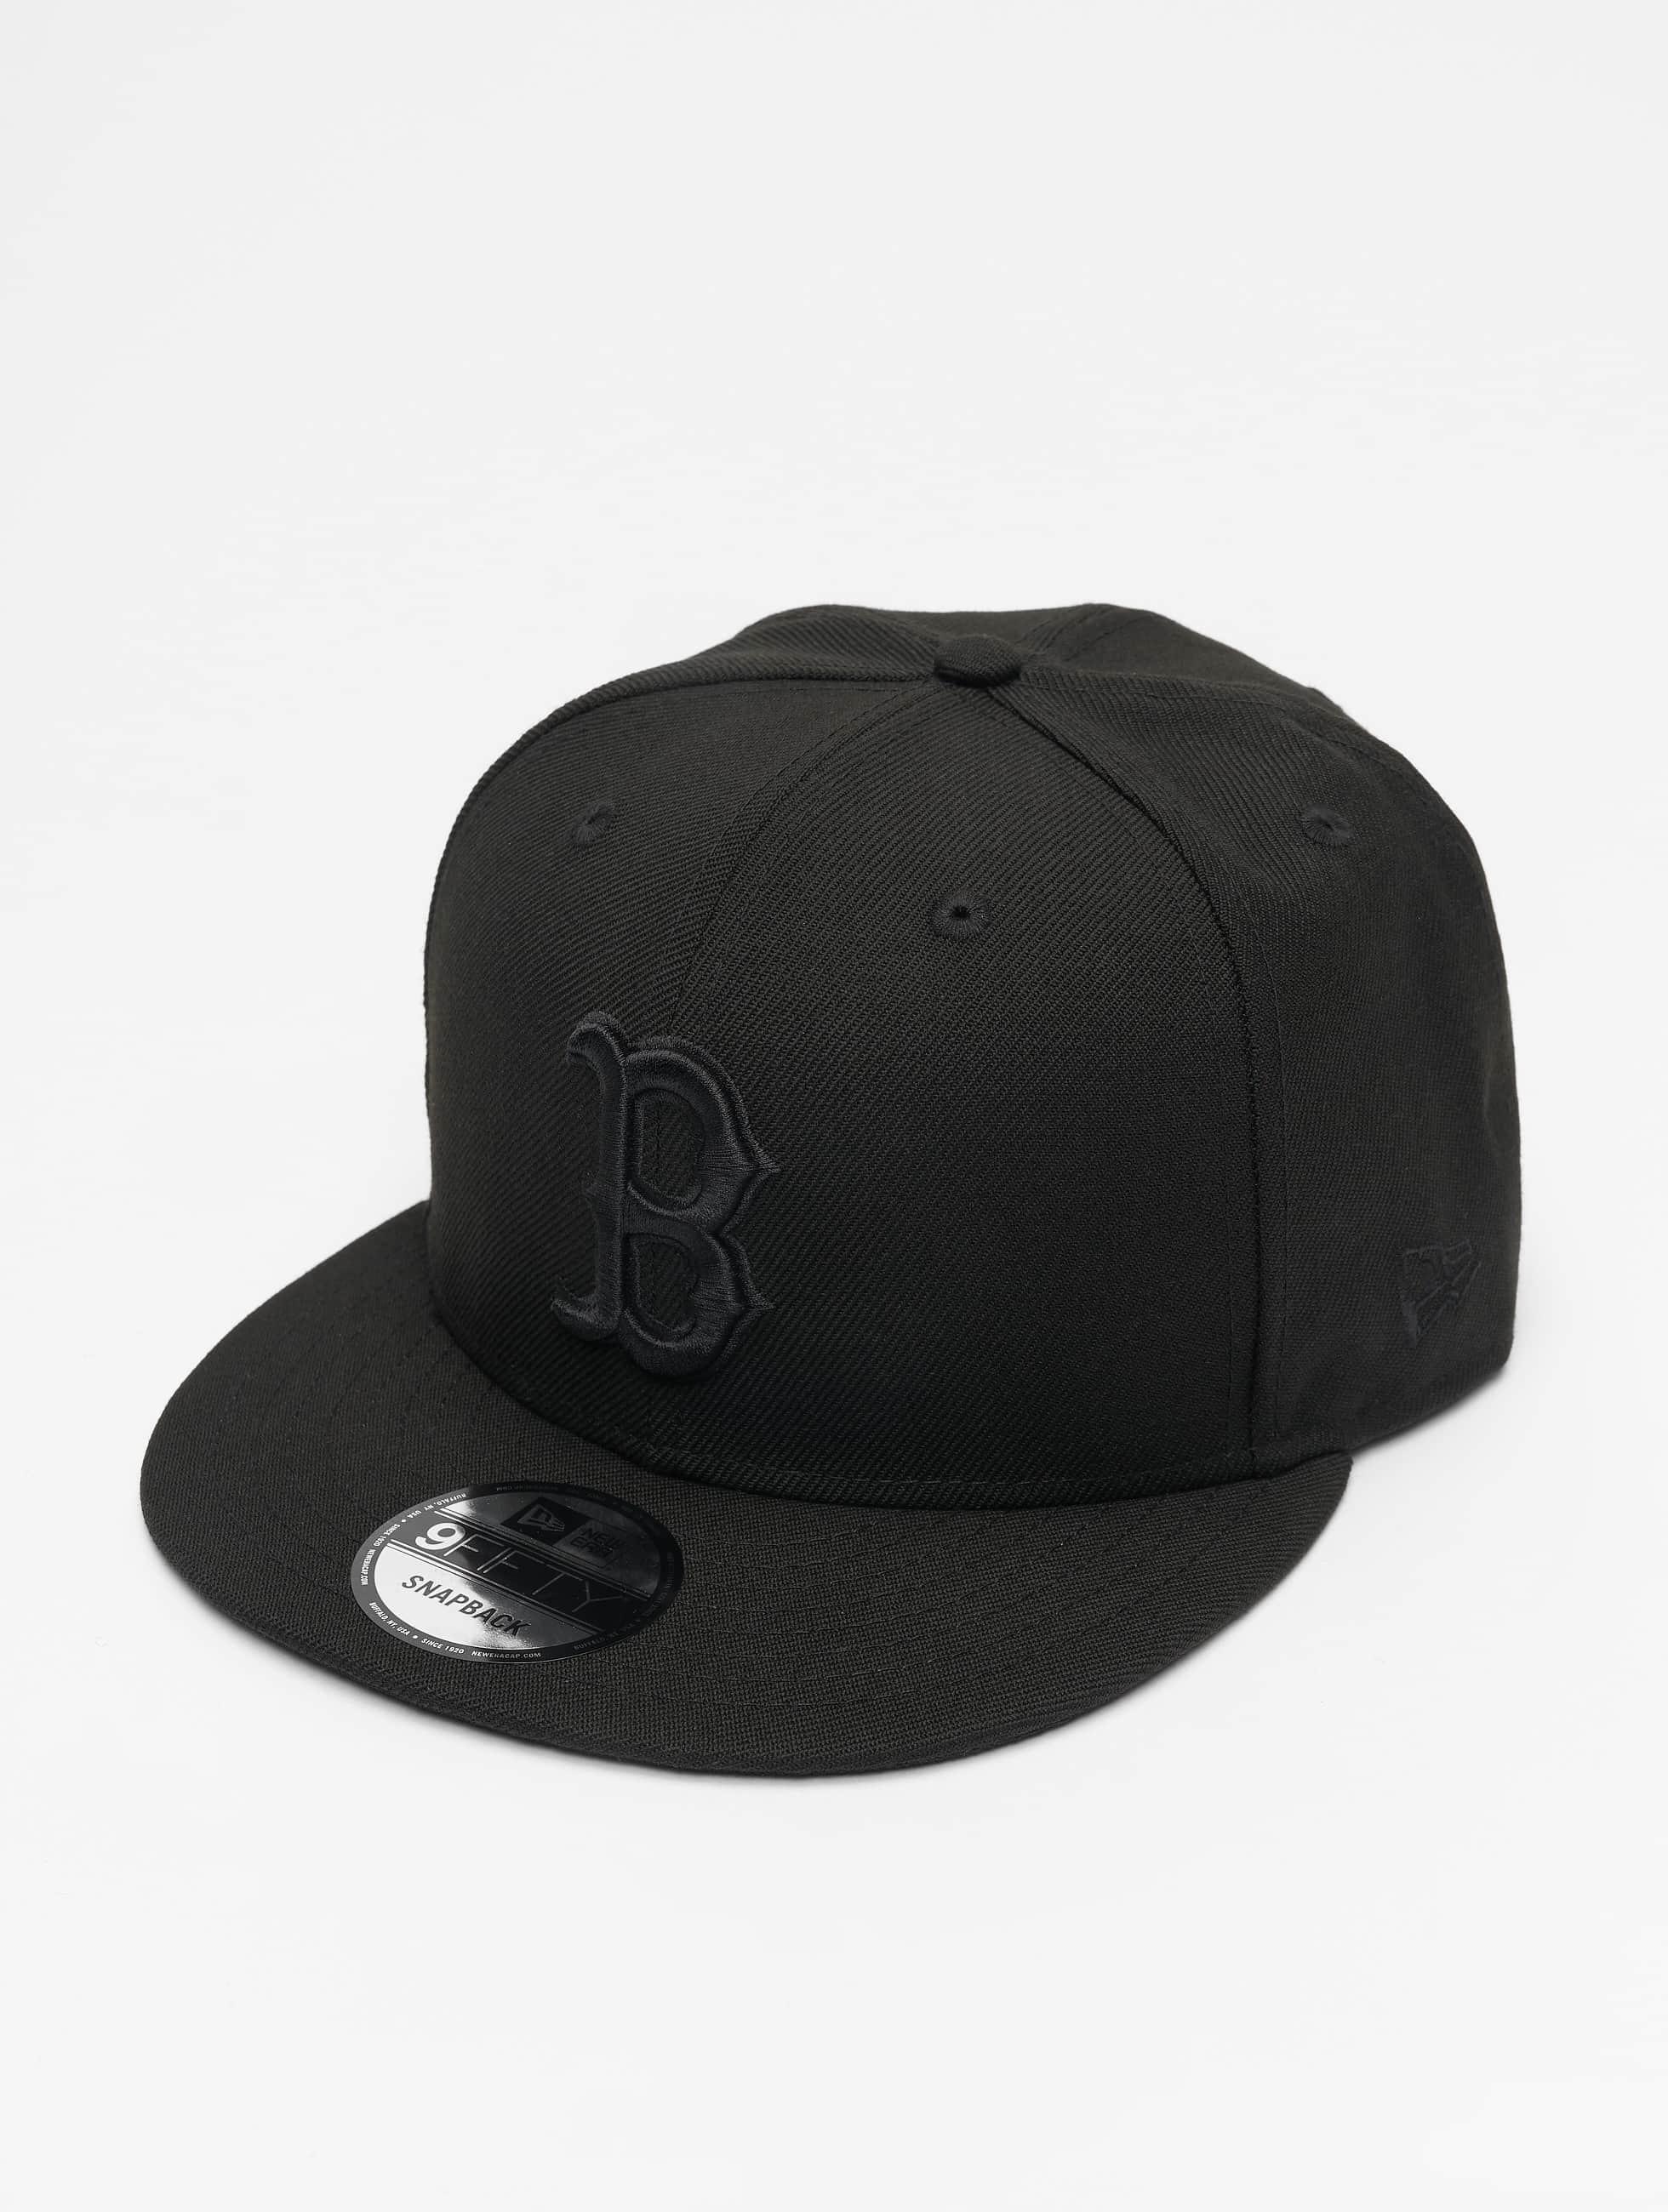 New Era Snapback Cap MLB Boston Red Sox 9Fifty in schwarz 629495